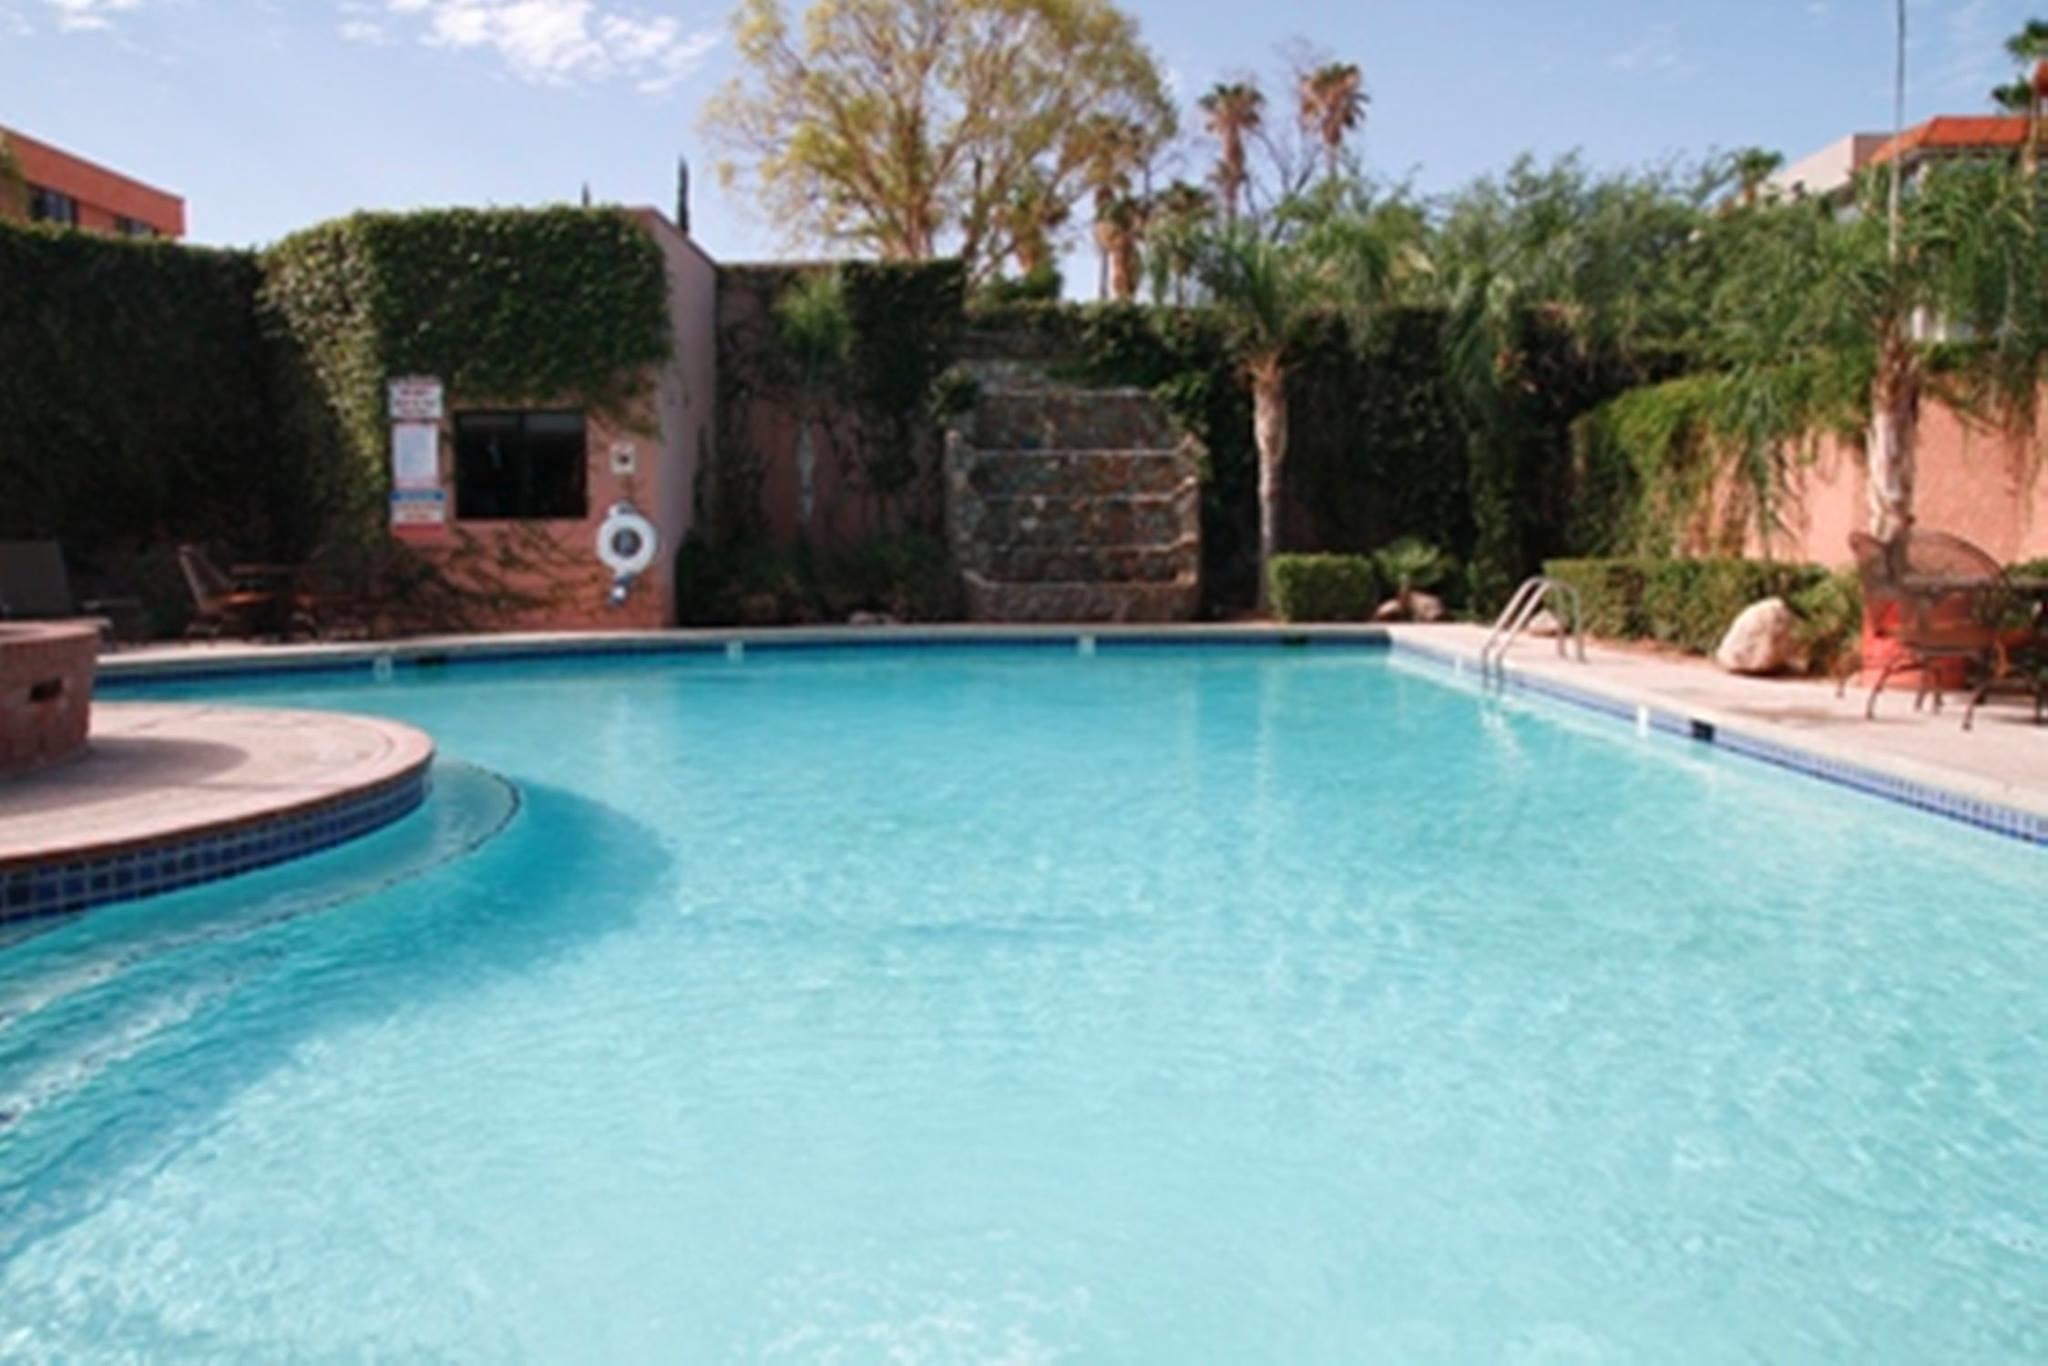 Viscount Suite Hotel image 13